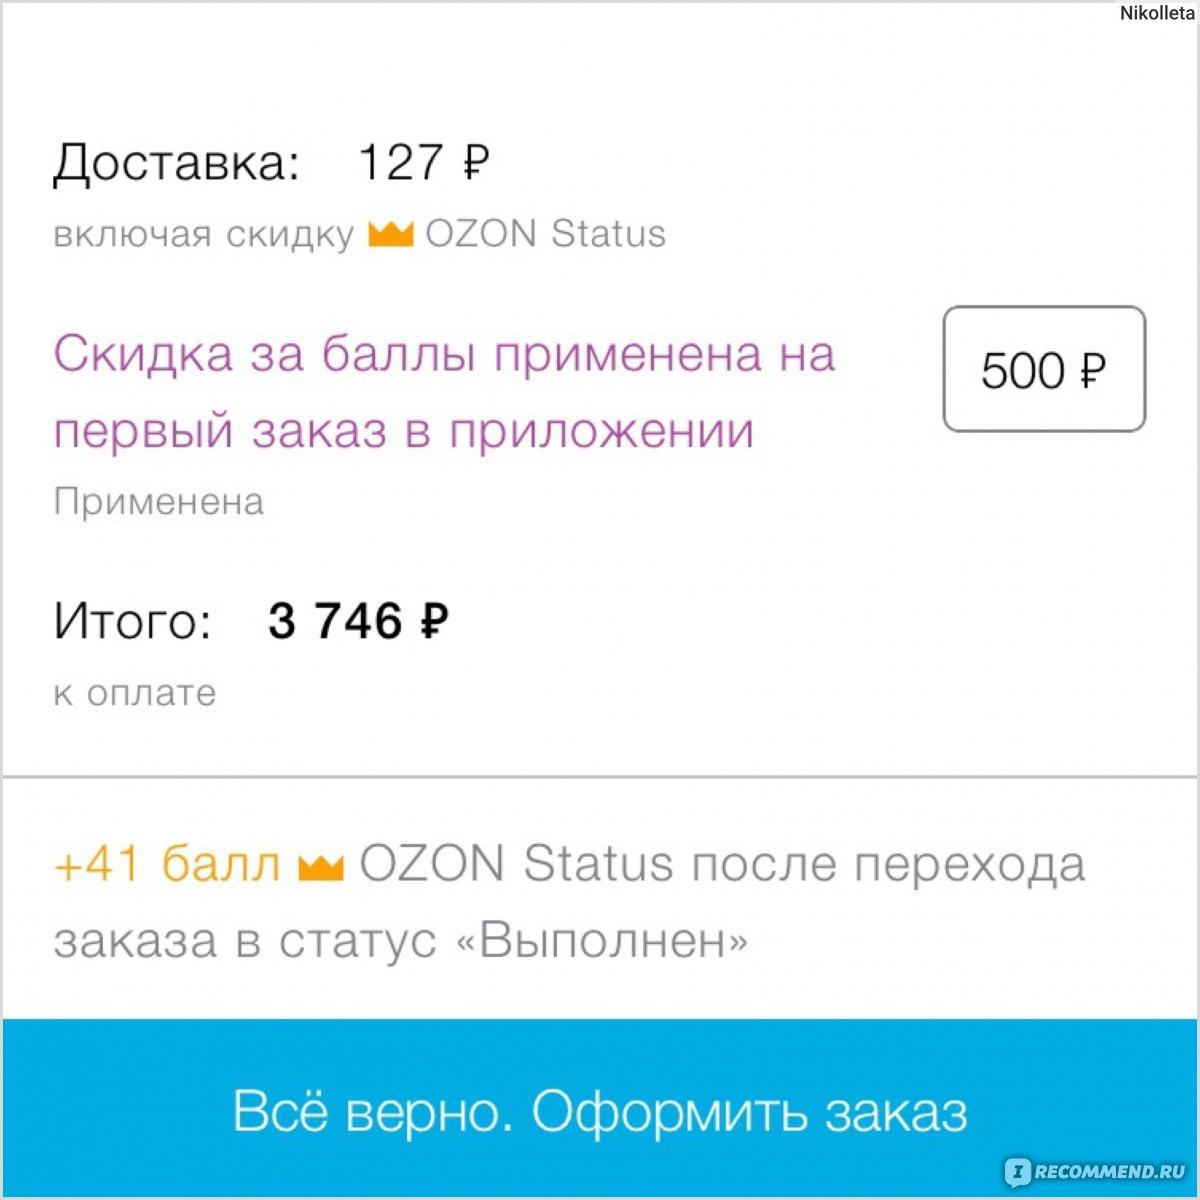 Ozon.ru» - интернет-магазин - «Самый НЕОДНОЗНАЧНЫЙ интернет-магазин ... c0e4488954a